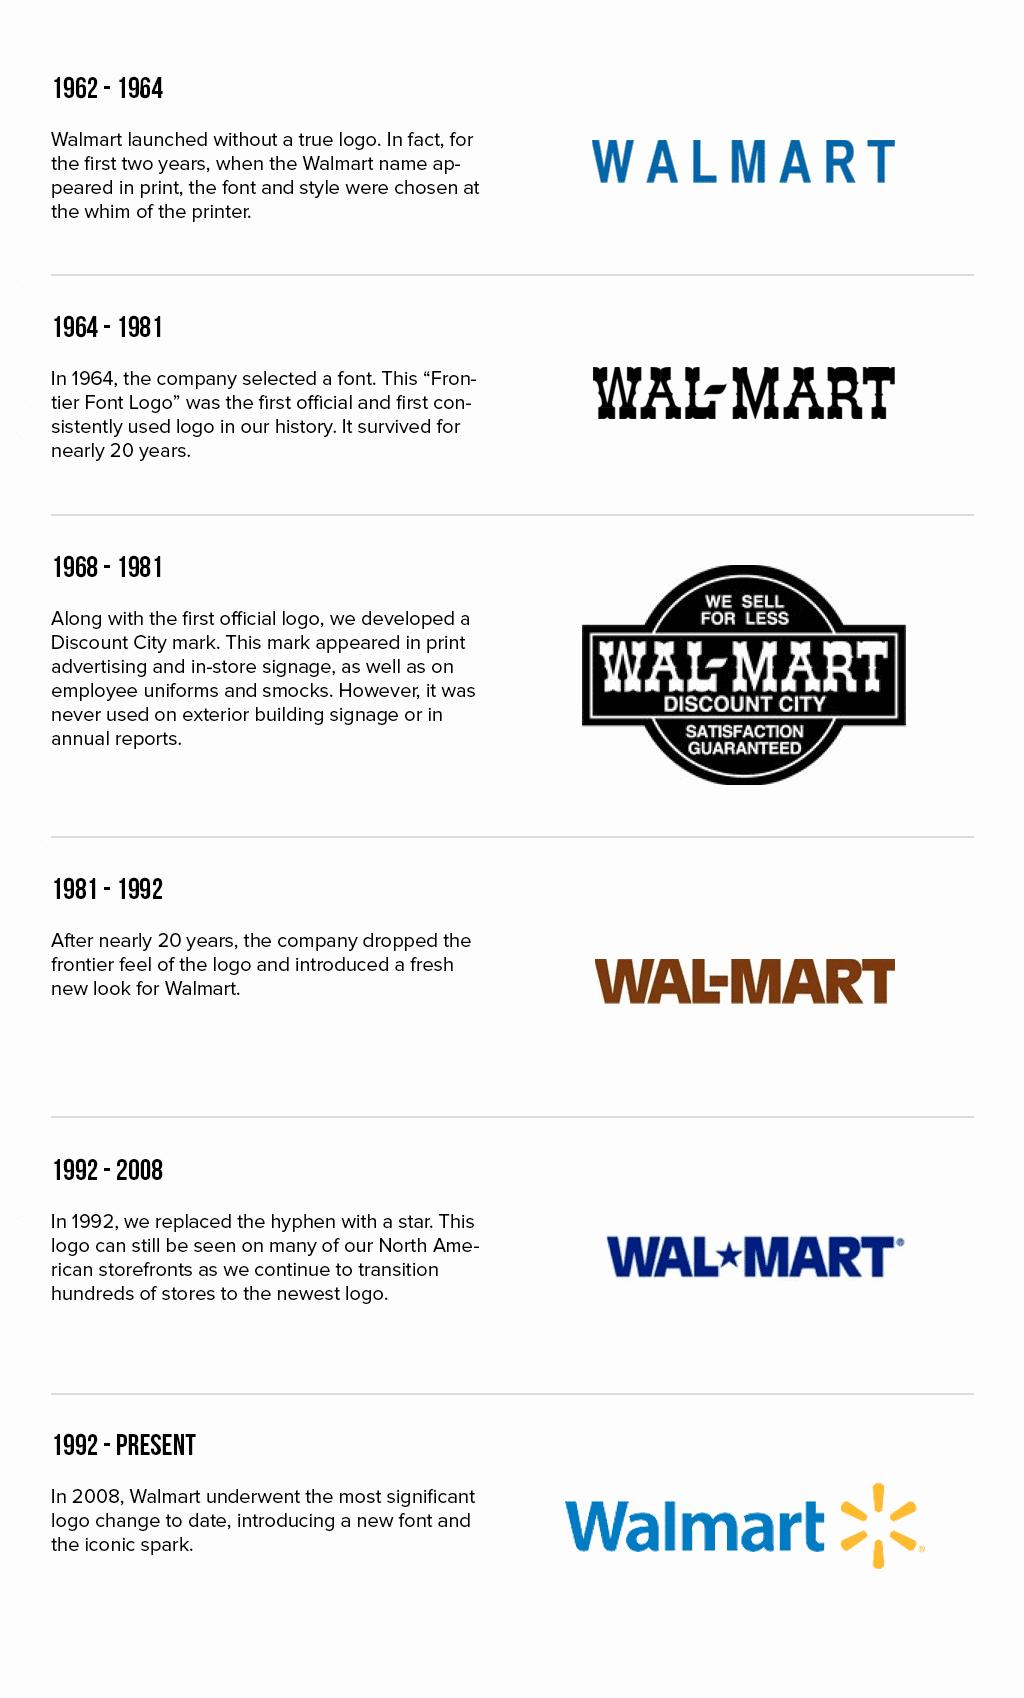 Walmart logo evolution